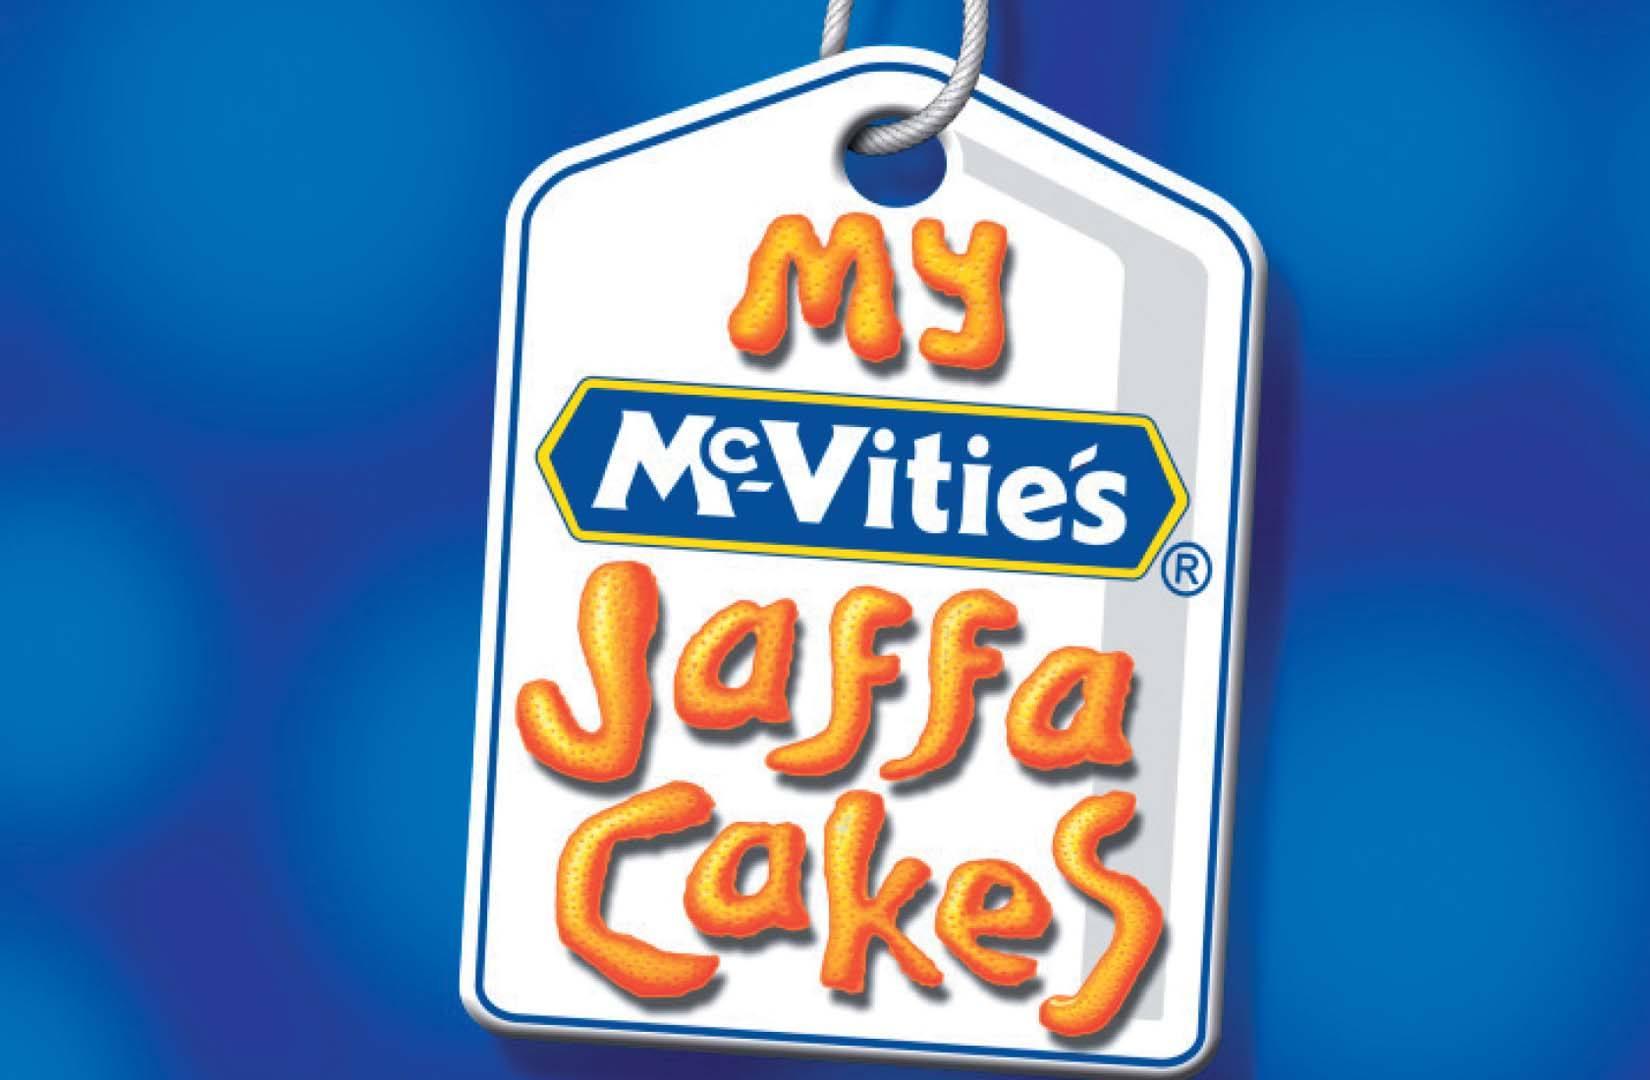 WMH-JAFFA-CAKE-MCVITIES-TAG-WEB image